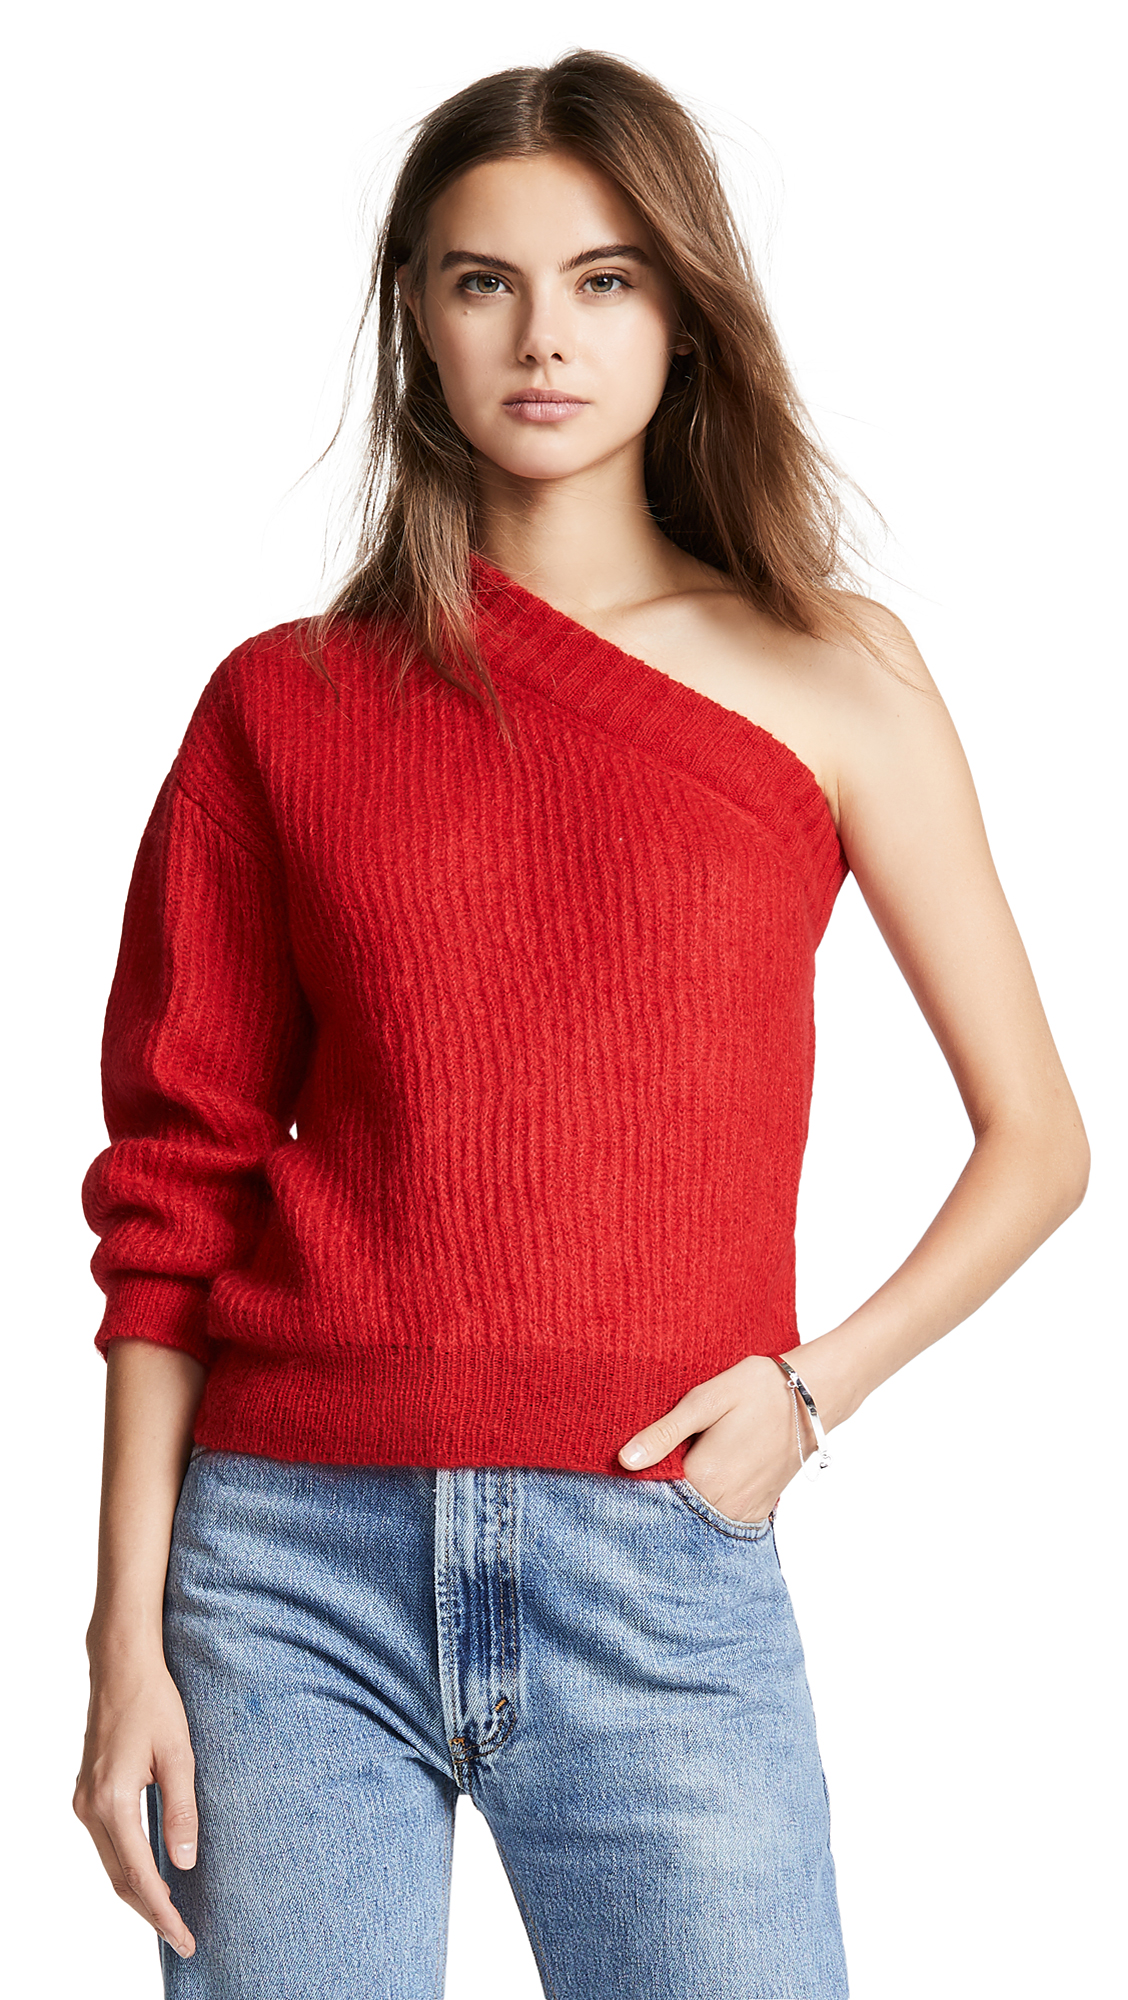 Nina Ricci Mohair One Sleeve Sweater - Red